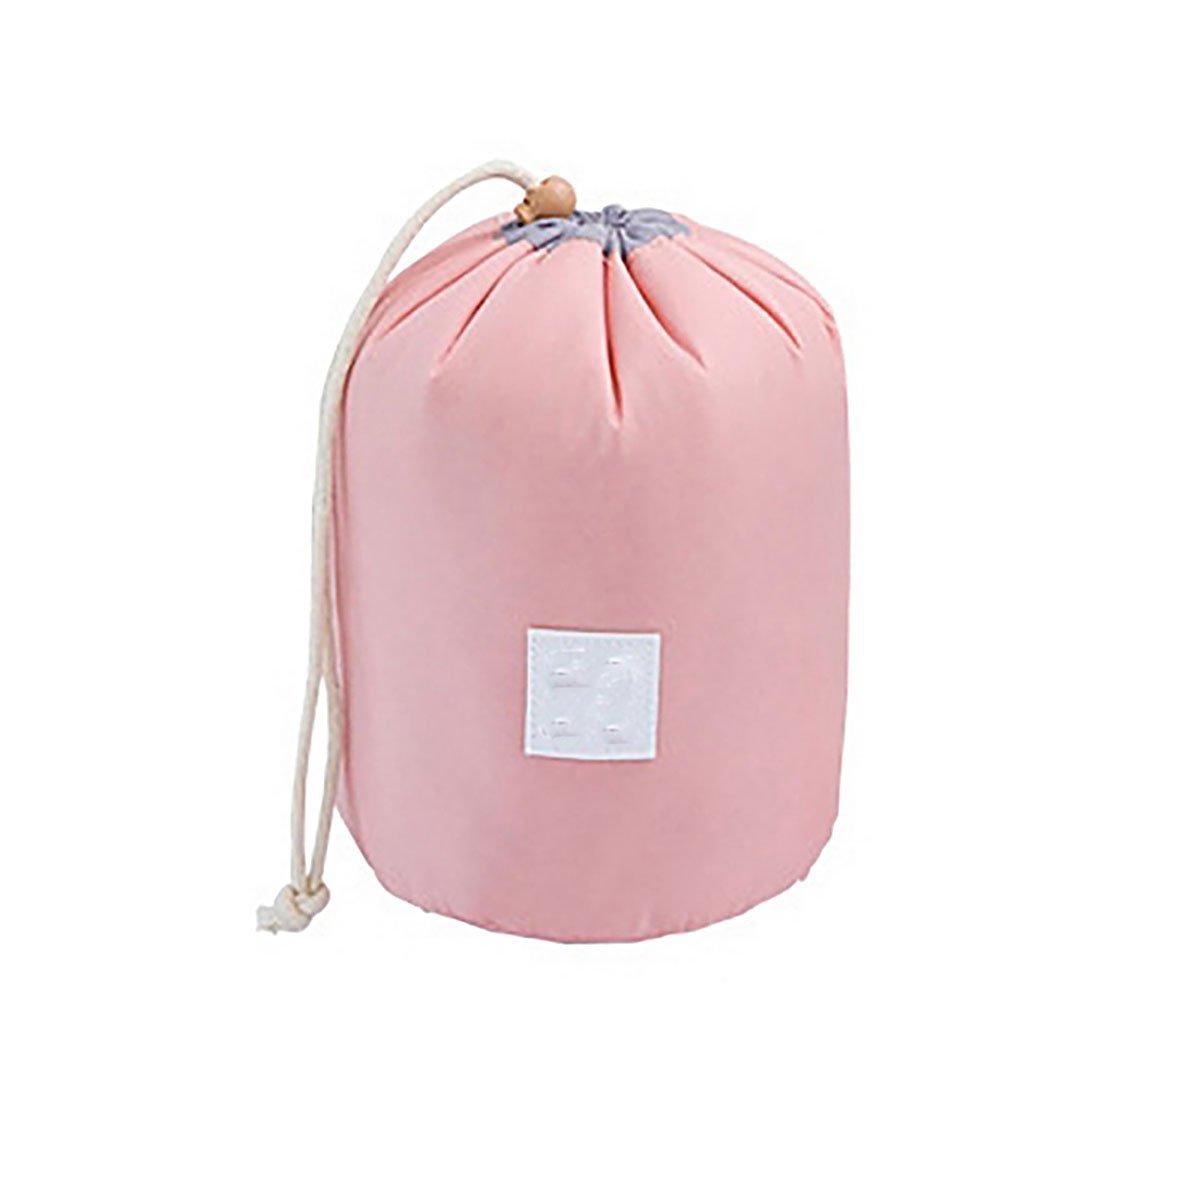 Red Pink Korean Packing Elegant Portable Large Capacity With Cylinder Cosmetic Bag Storage Makeup Drawstring Bag Backpack 23cmx17cm-1 FANSI